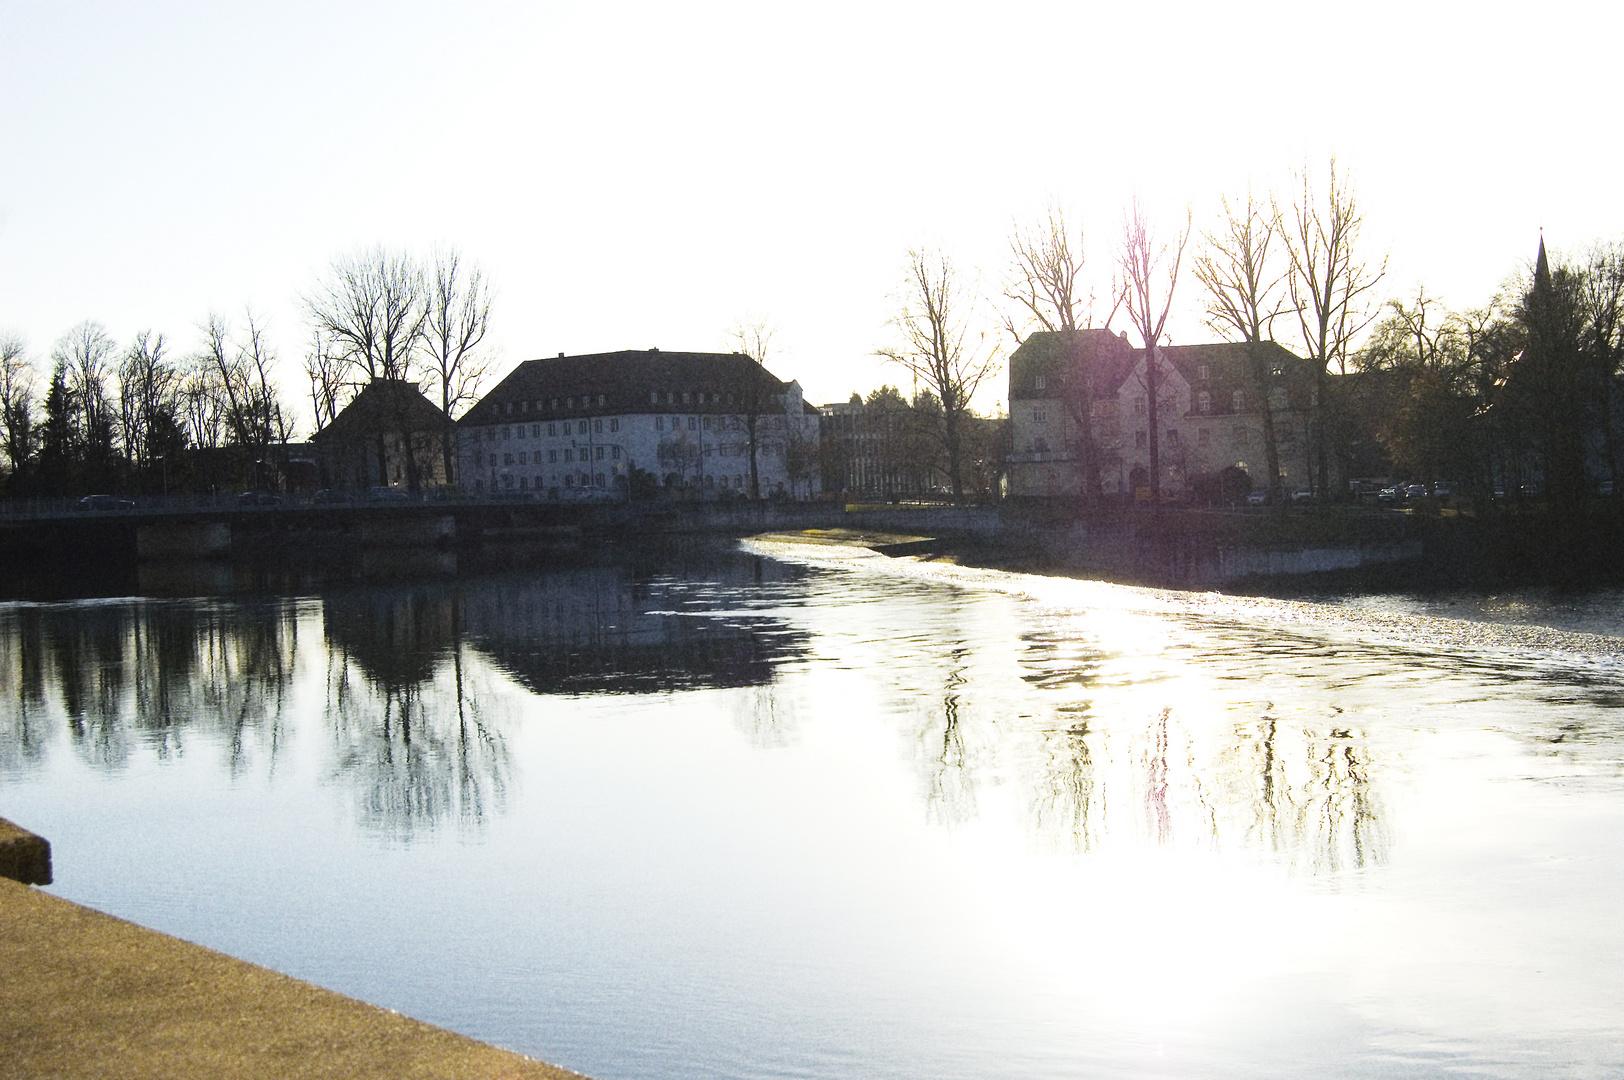 Lechstaufe (Landsberg am Lech, Oberbayern)